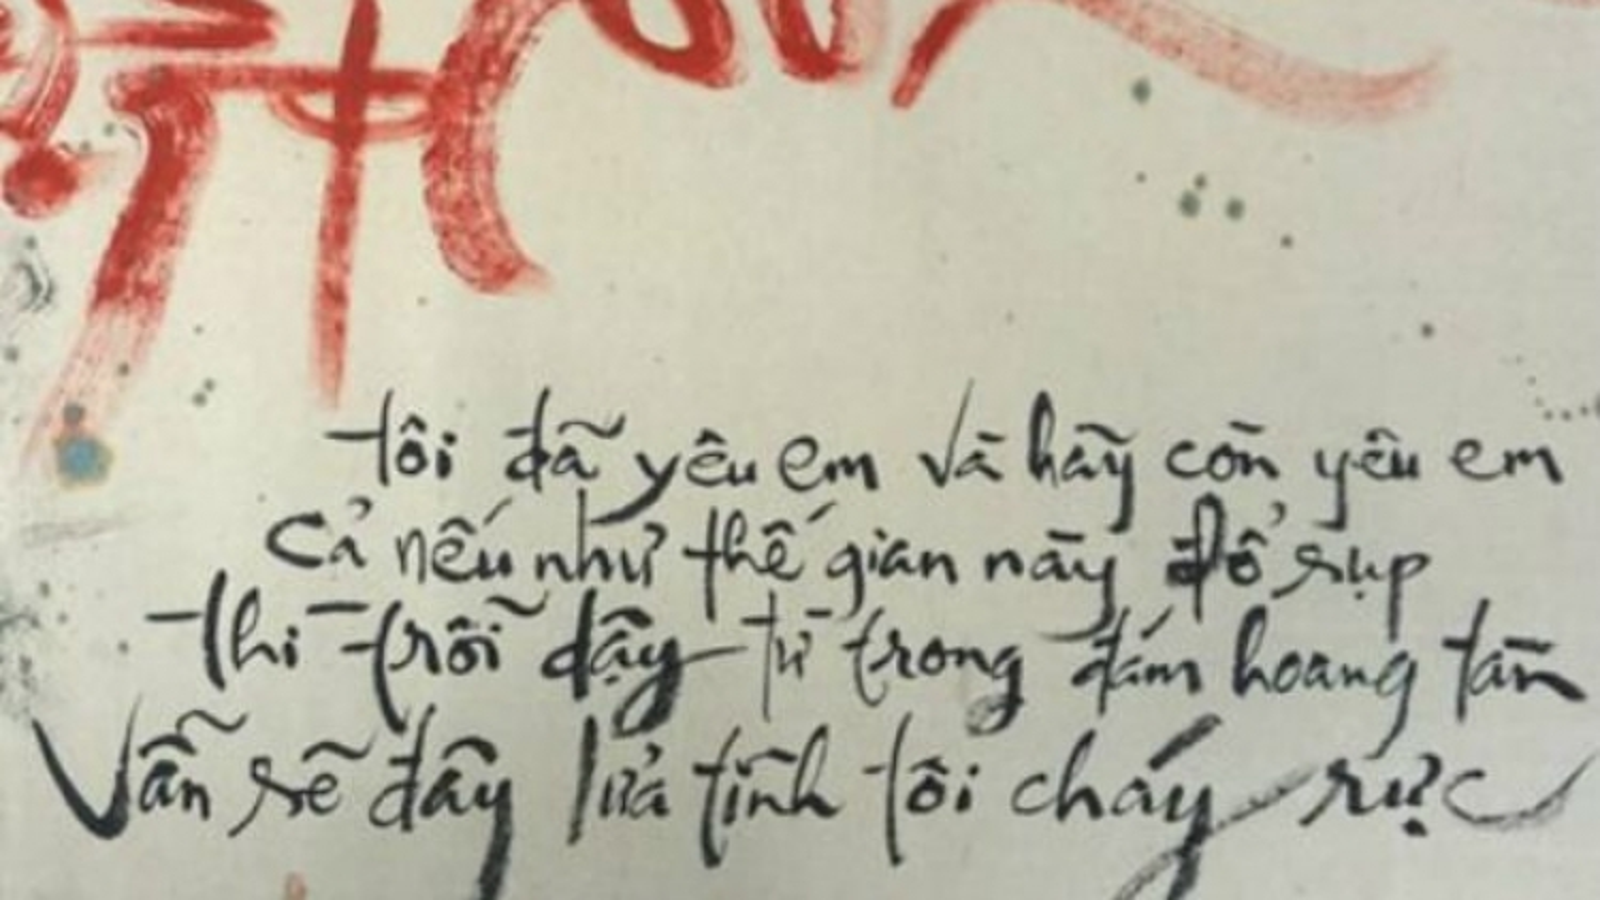 Exhibition combines German poetry and Vietnamese calligraphy